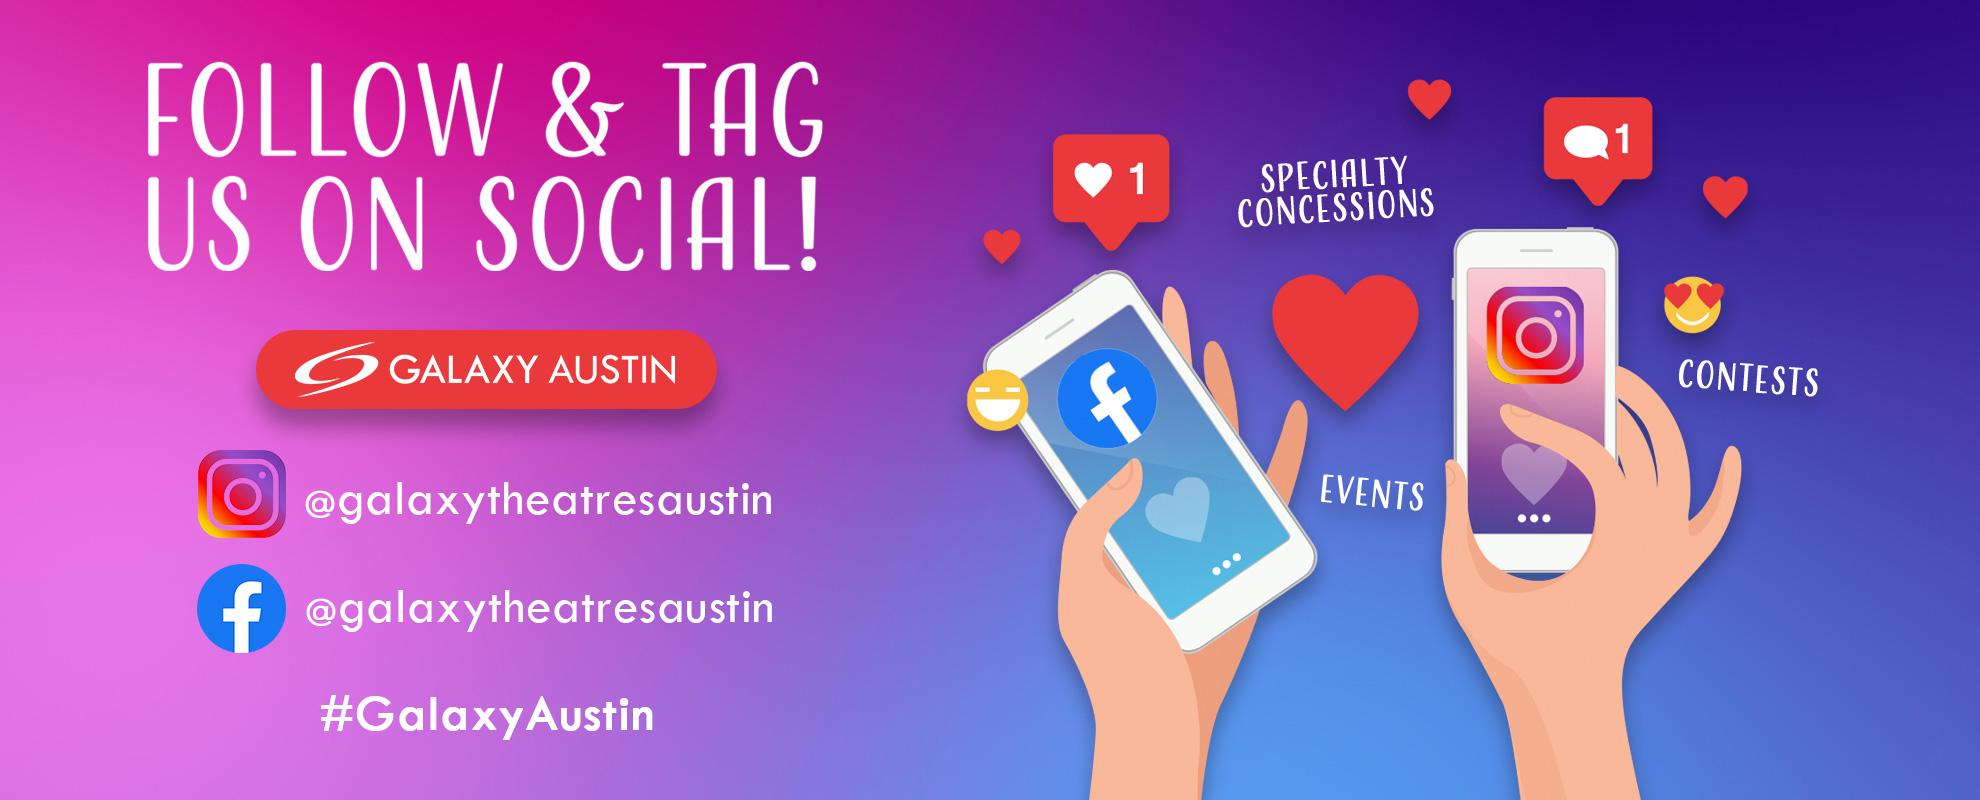 Socials/Hashtag - Austin image